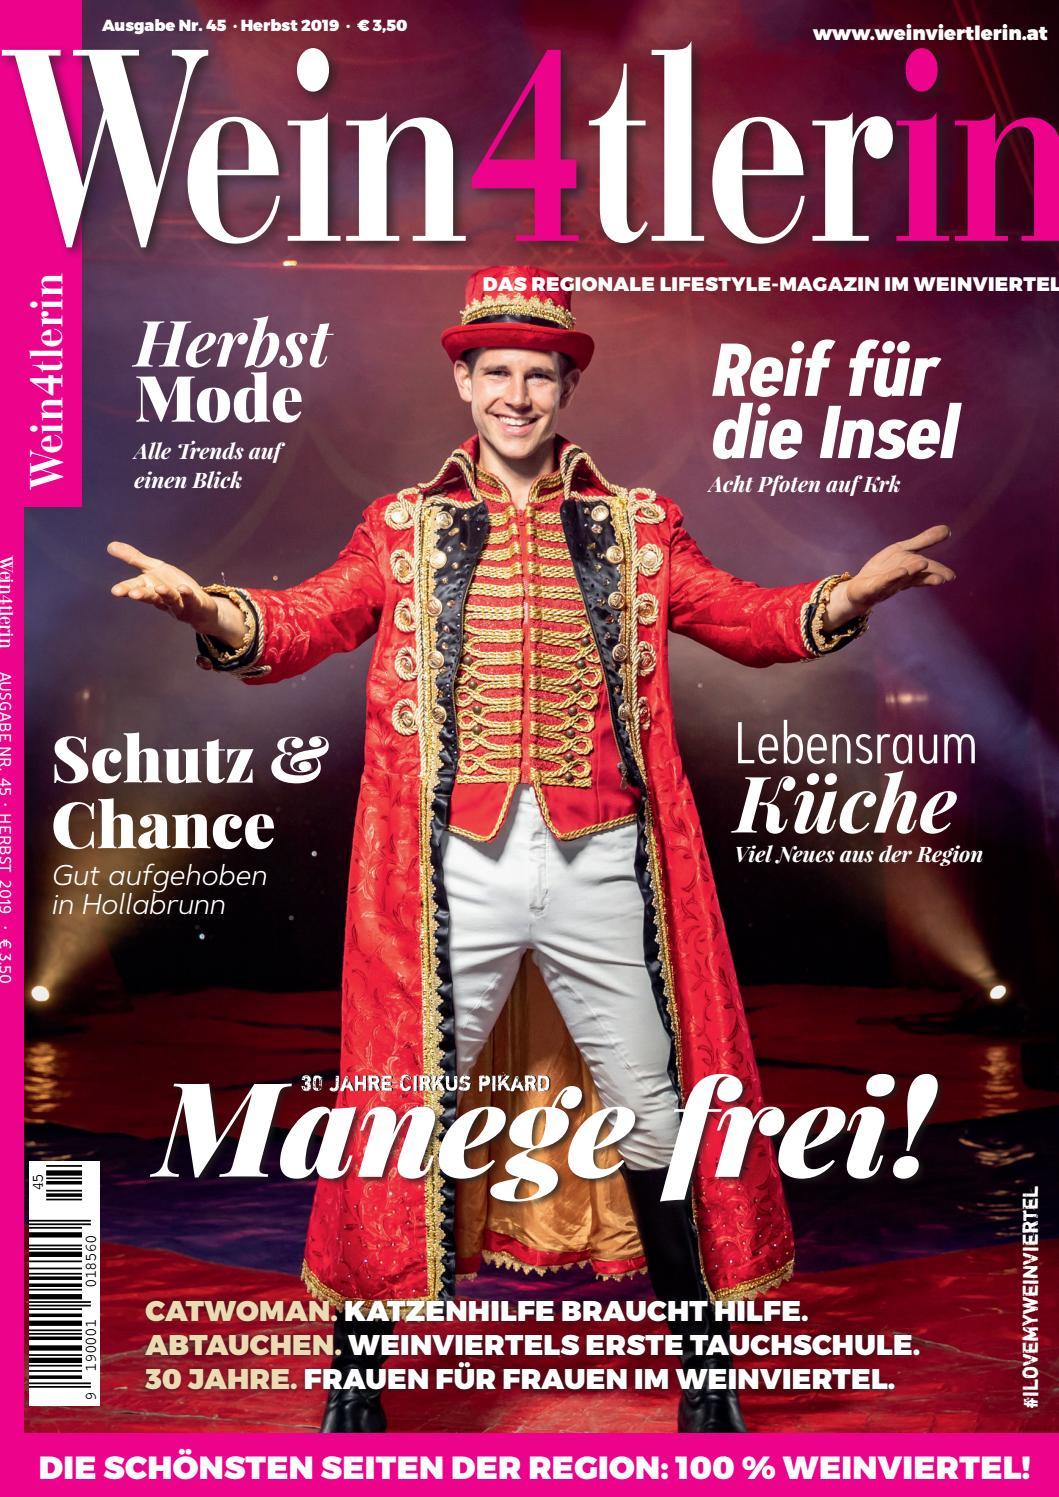 Singlebrse in Mistelbach und Singletreff - flirt-hunter